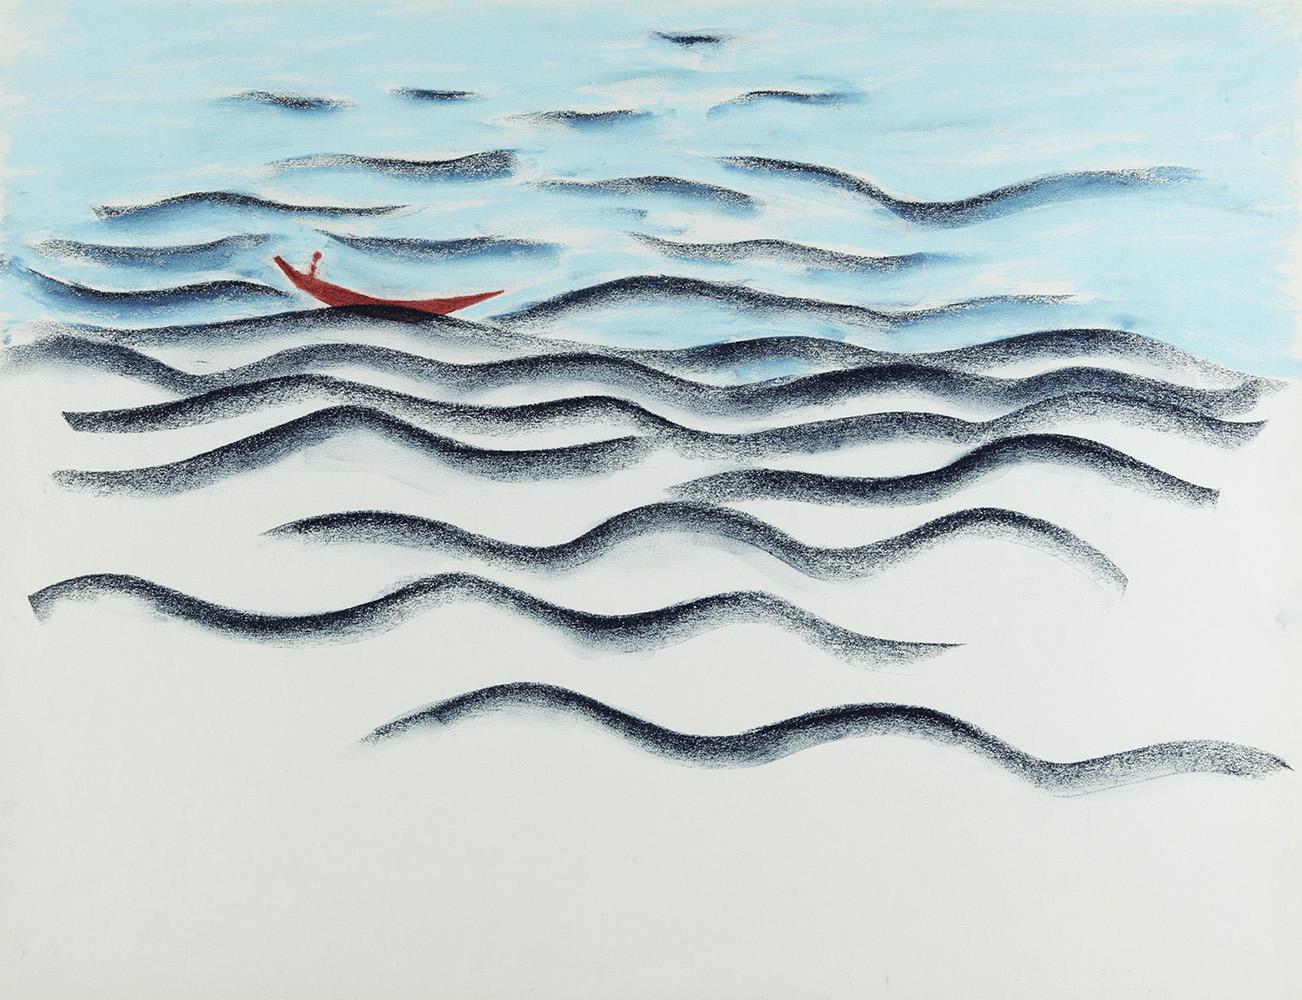 Droom - potlood & pastelkrijt - 50x70 cm - verkocht